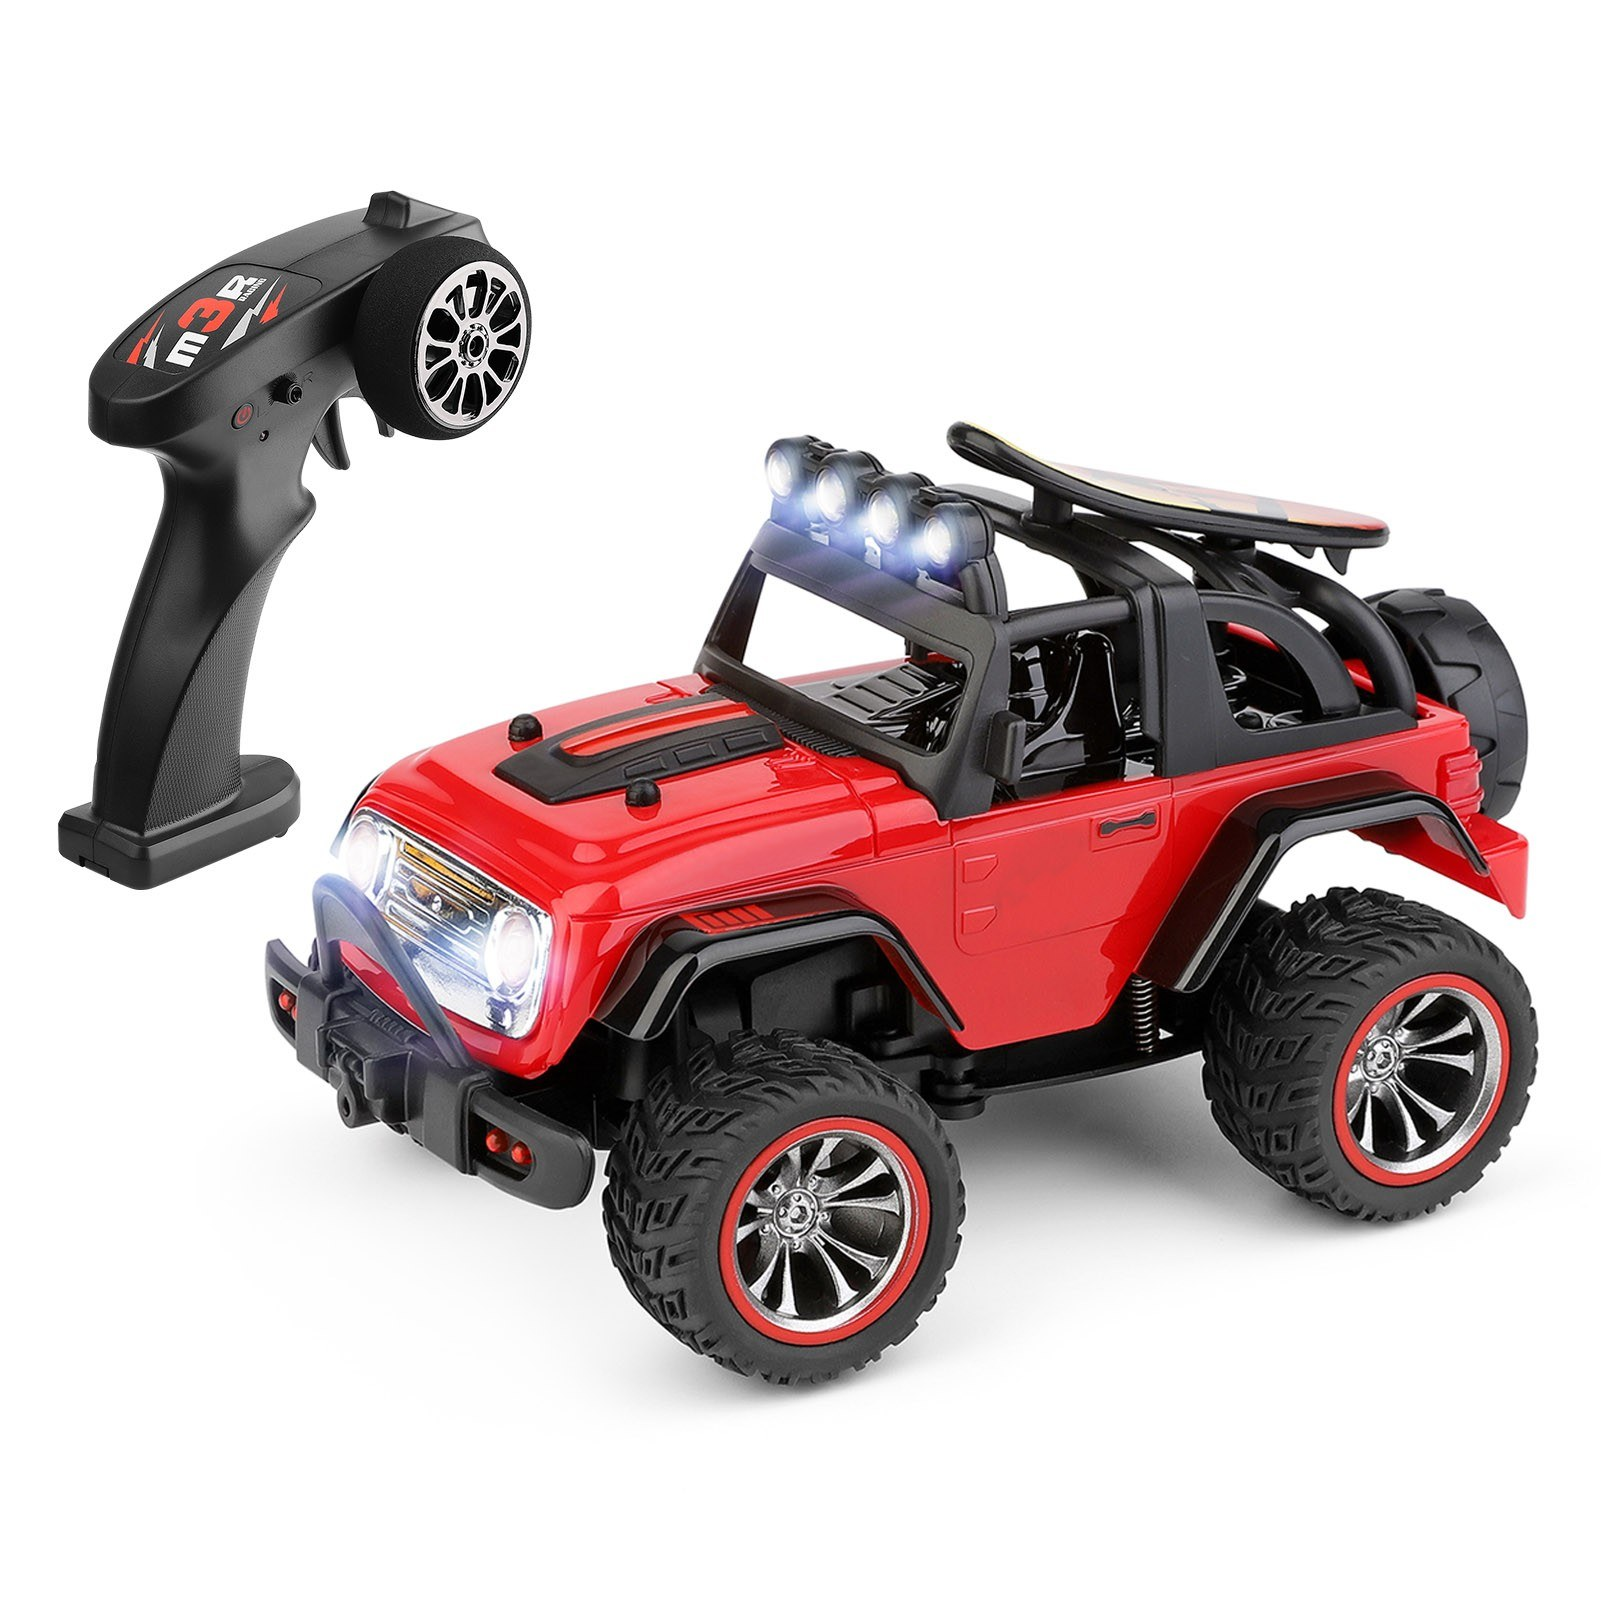 tomtop.com - 63% OFF WLtoys 322221 2.4GHz Off-Road Car 1/32 25km/h, $26.99 (Inclusive of VAT)